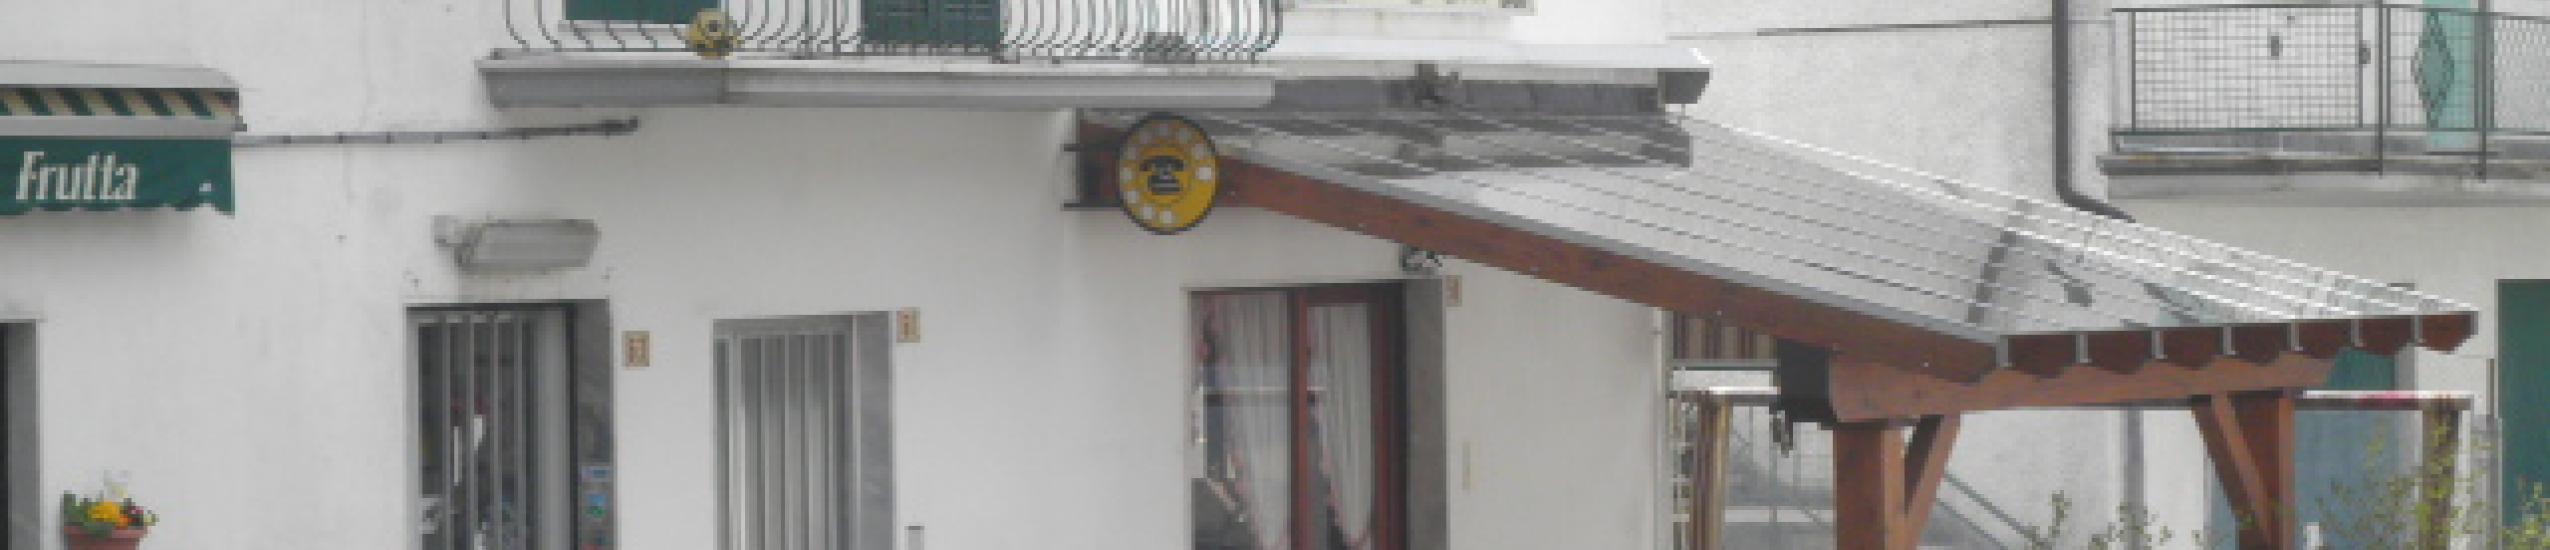 Ristorante pizzeria Santa Rita